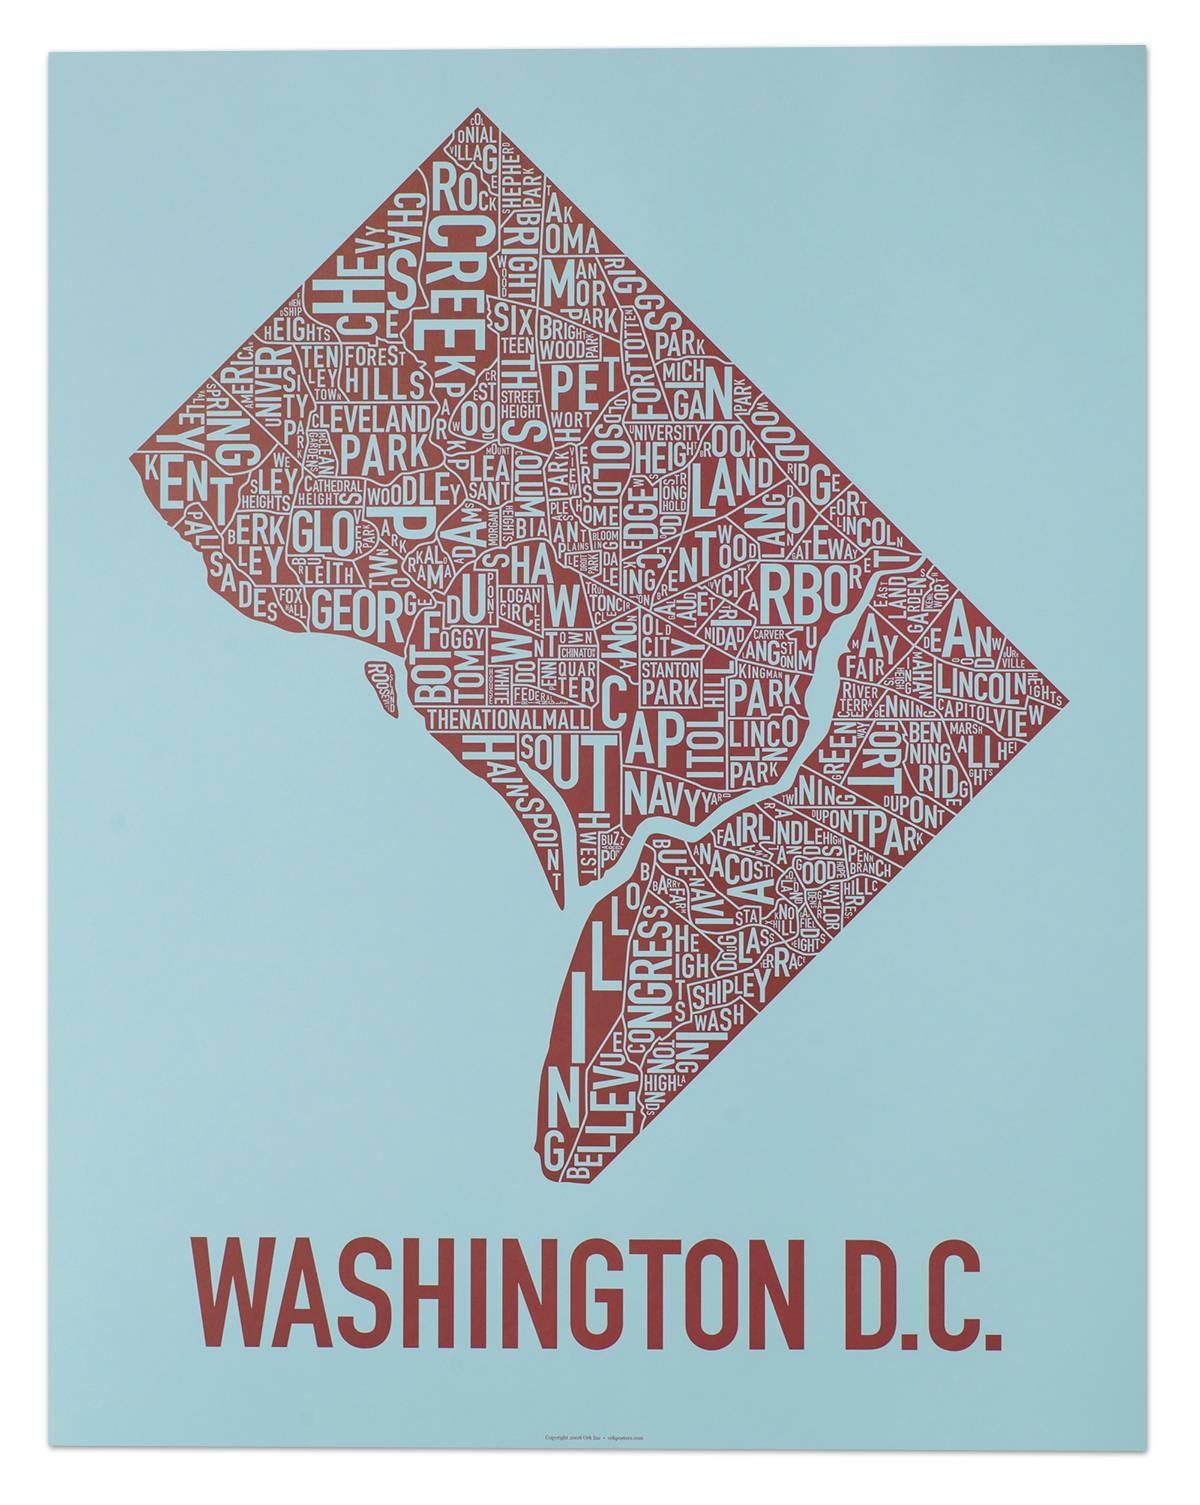 Washington Dc Neighborhood Map Posters & Prints – Modern Wall Decor For Latest Washington Dc Map Wall Art (View 17 of 20)